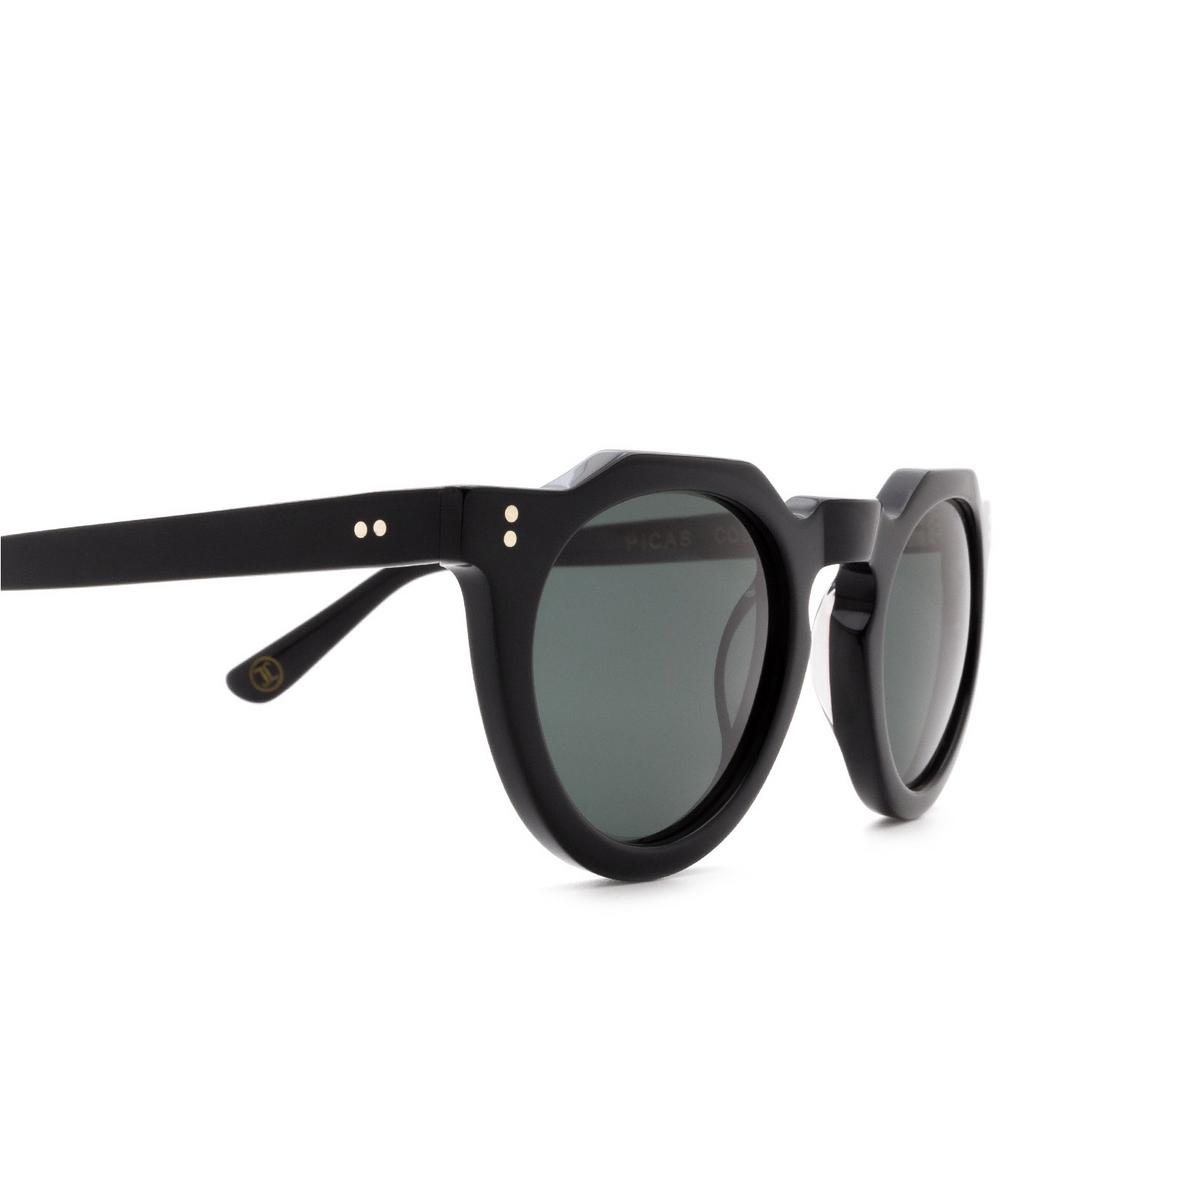 Lesca® Irregular Sunglasses: Picas color Noir 5 - 3/3.